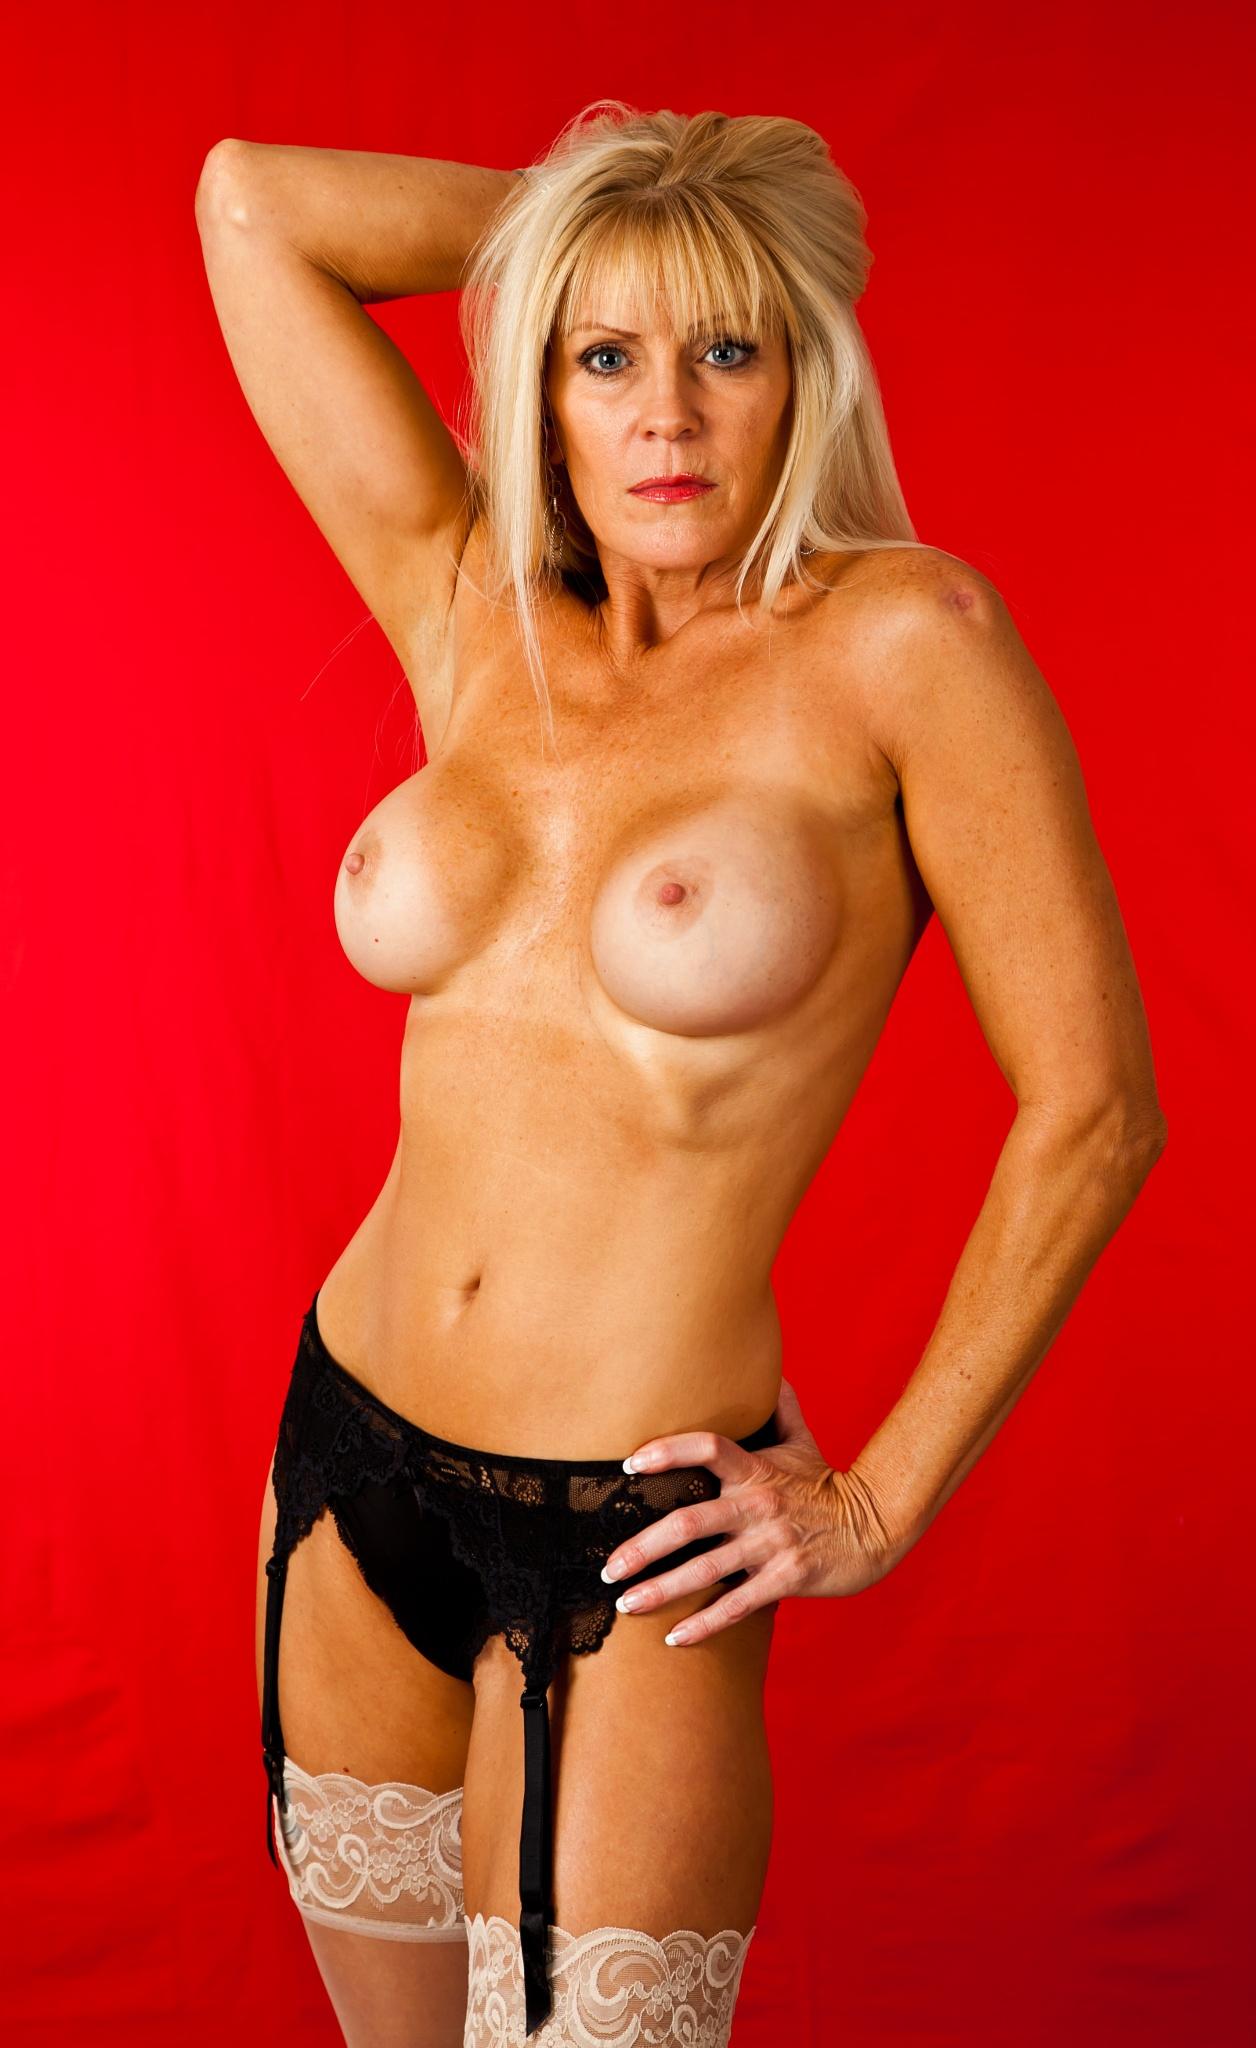 Still hot at 50 by Ed Woodson Photography GA